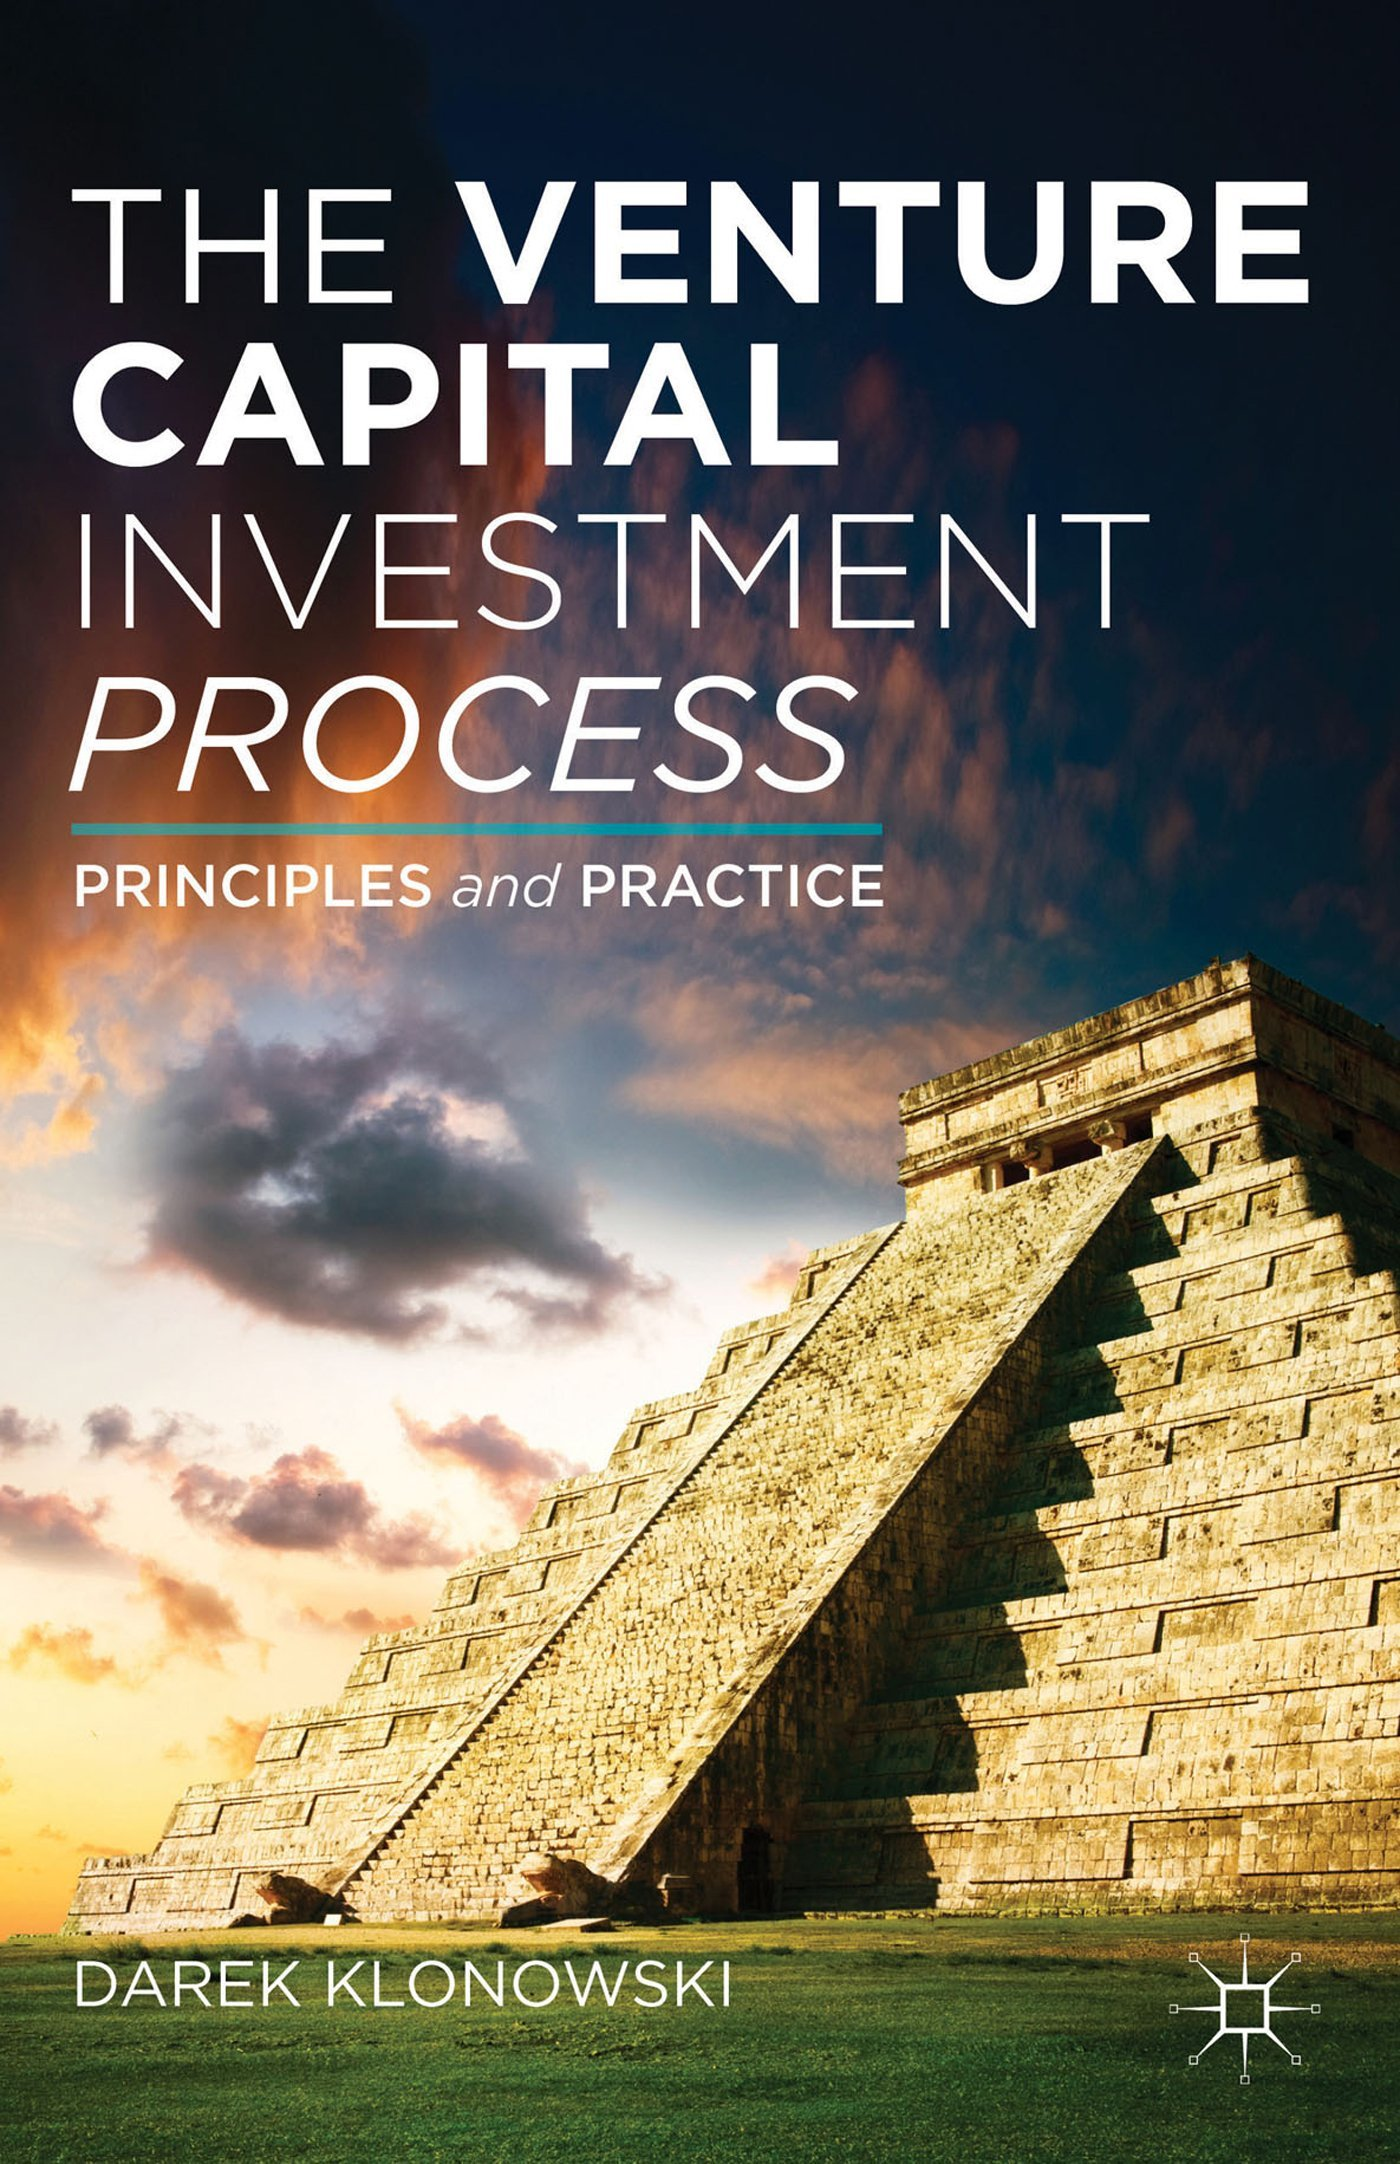 the venture capital investment process darek klonowski